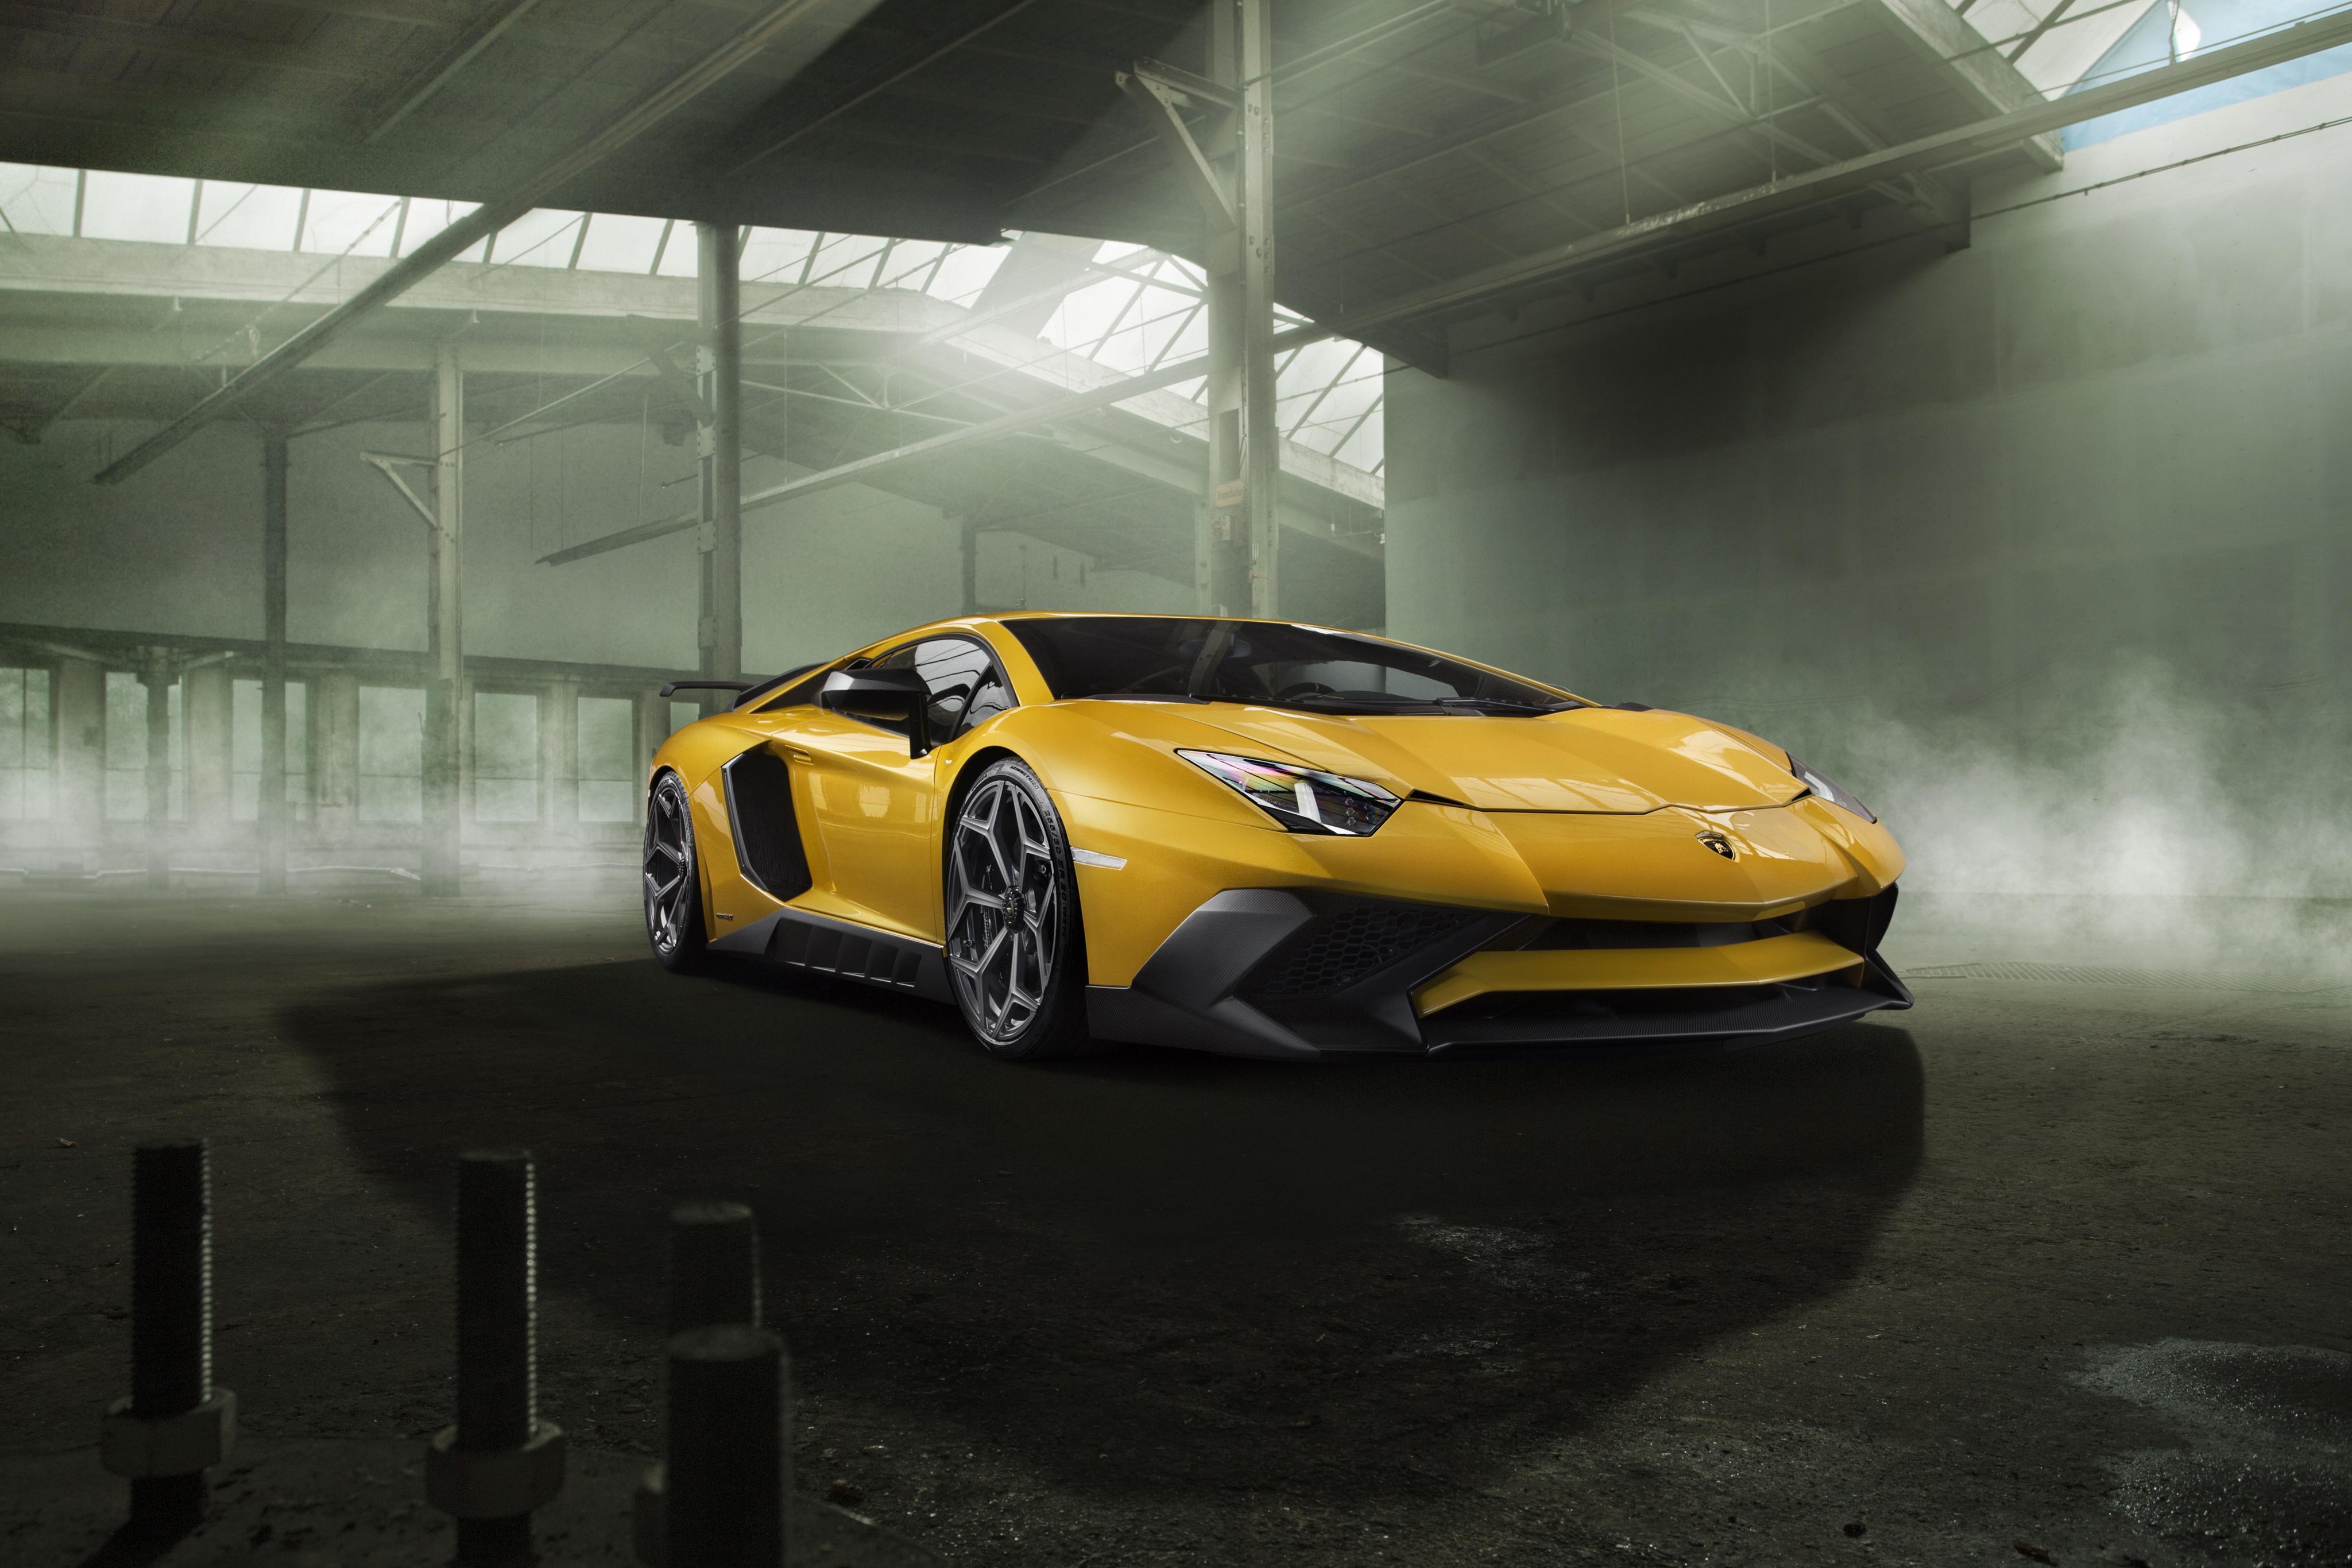 132535 Заставки и Обои Ламборджини (Lamborghini) на телефон. Скачать Ламборджини (Lamborghini), Тачки (Cars), Вид Сбоку, Желтый, Aventador картинки бесплатно